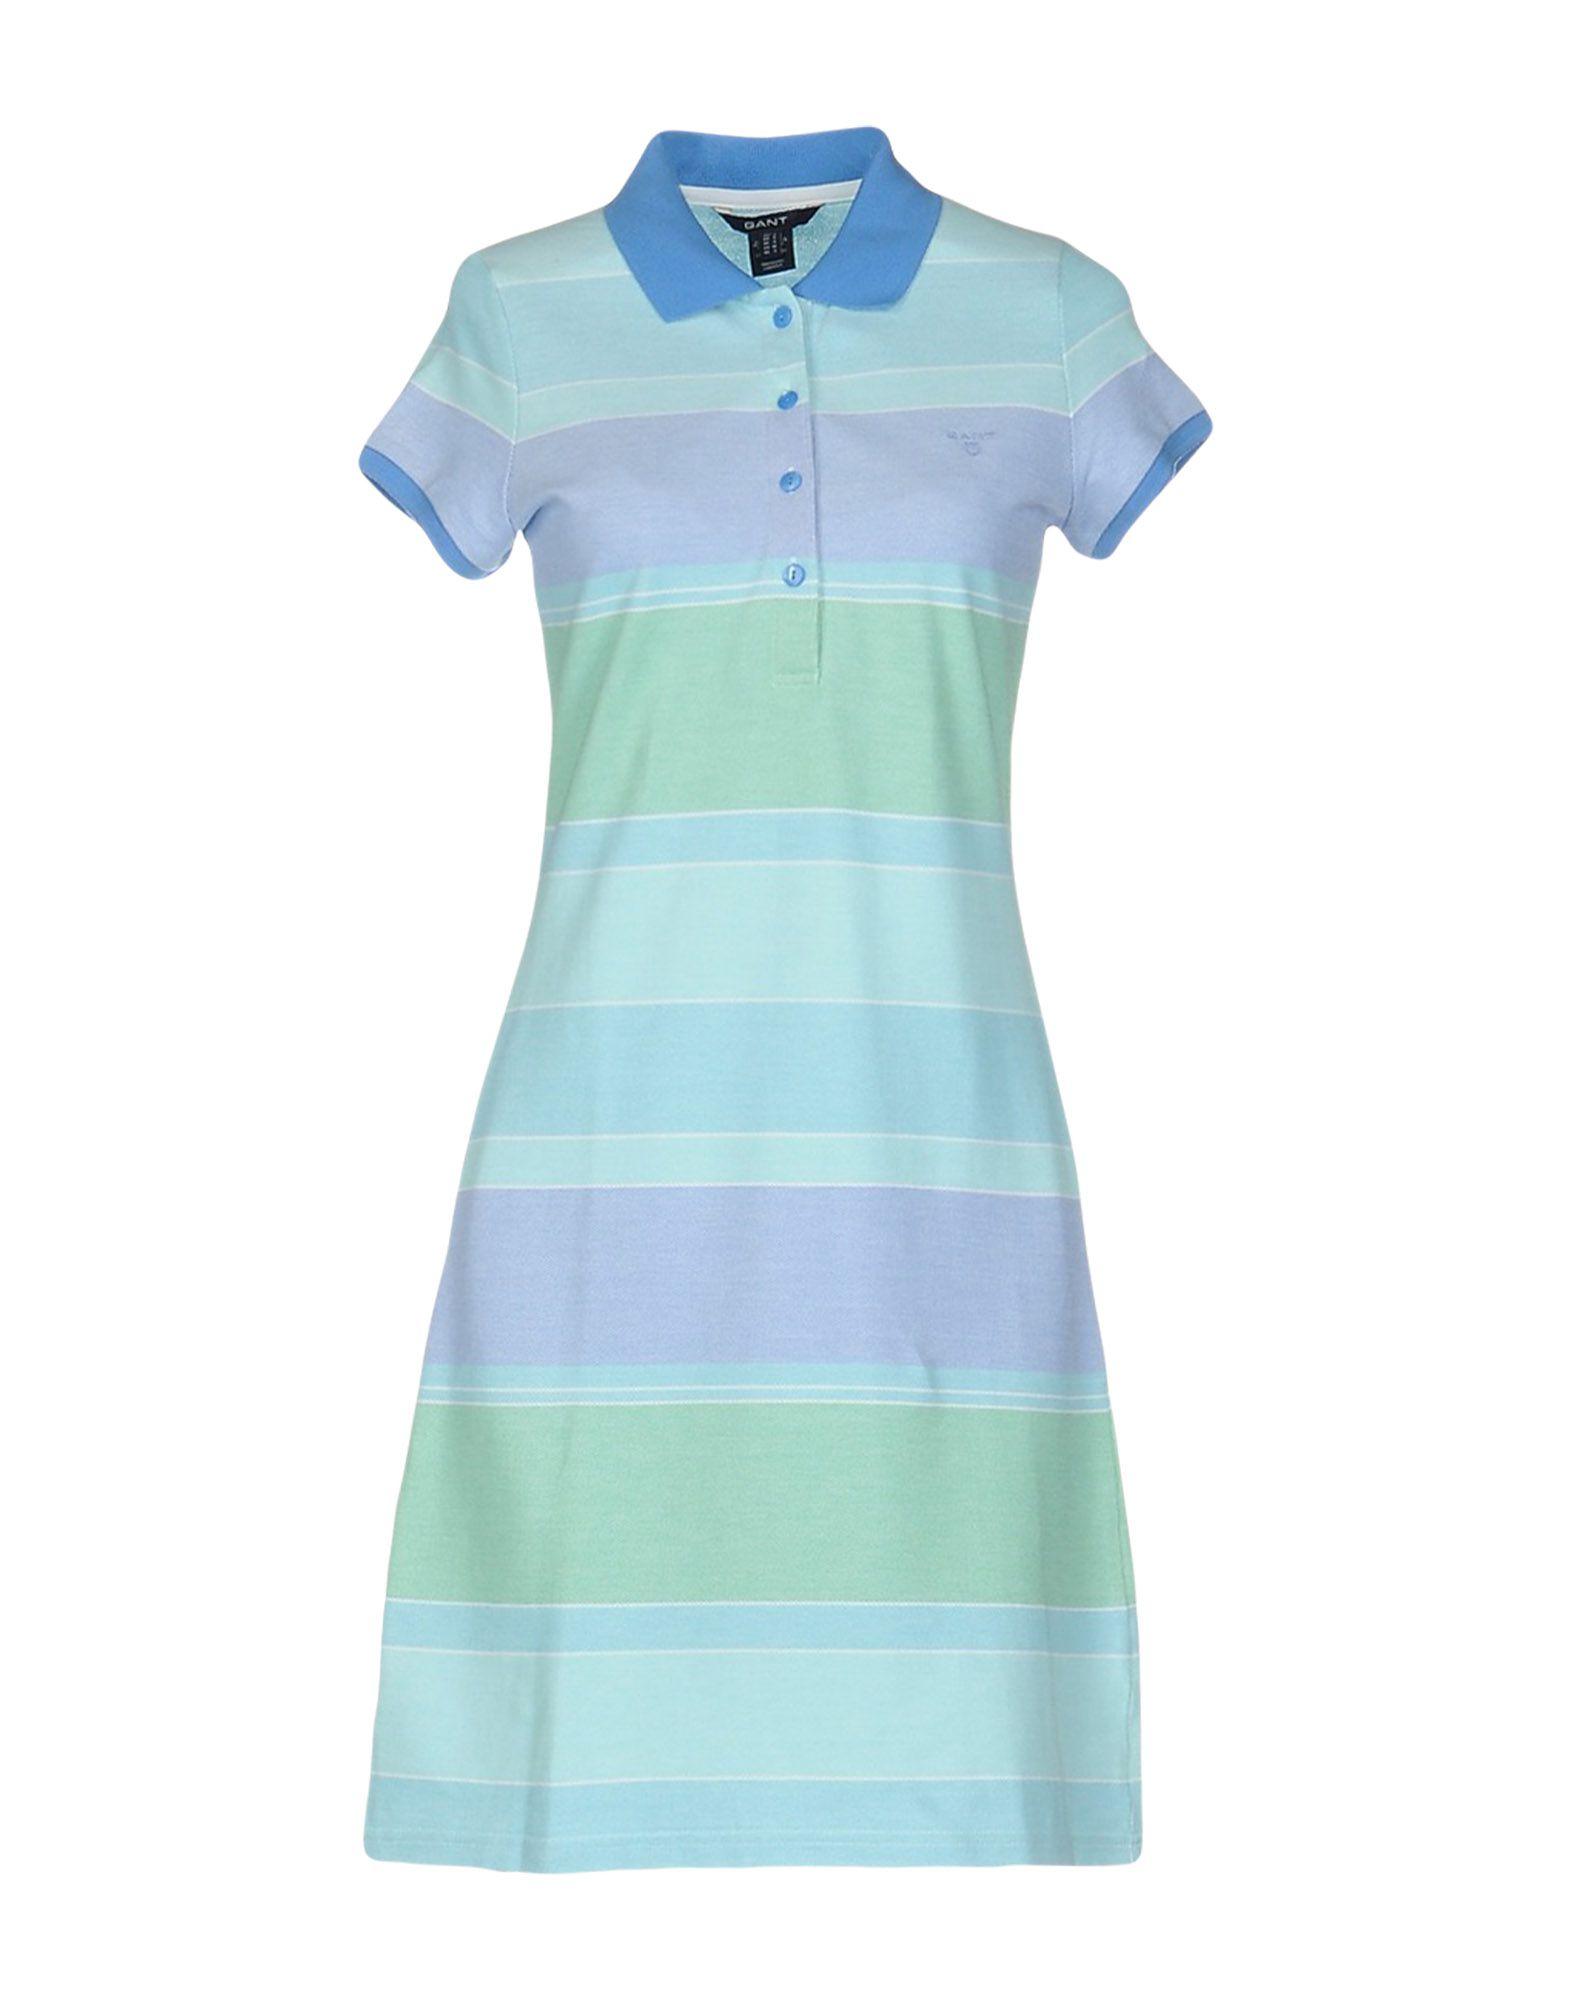 2d8e5b8782e7 GANT - Yoox - Γυναικεία Φορέματα